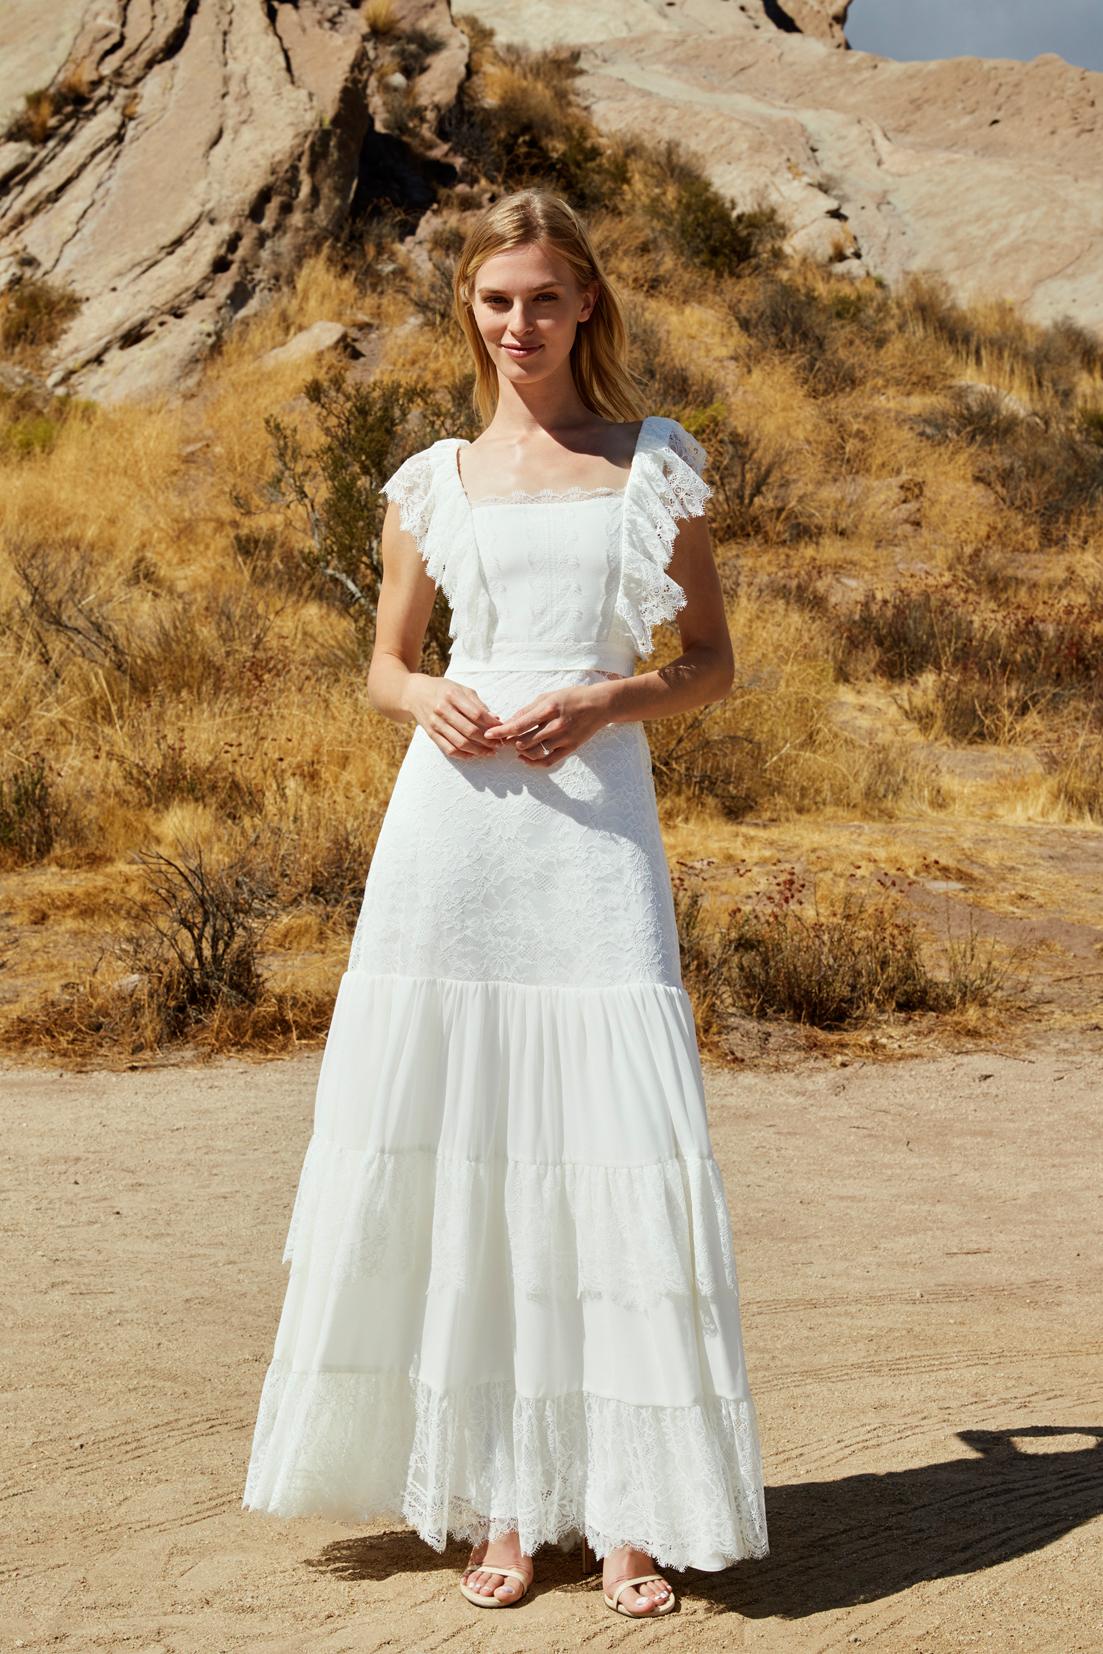 savannah miller fall 2018 tiered lace sleeve wedding dress